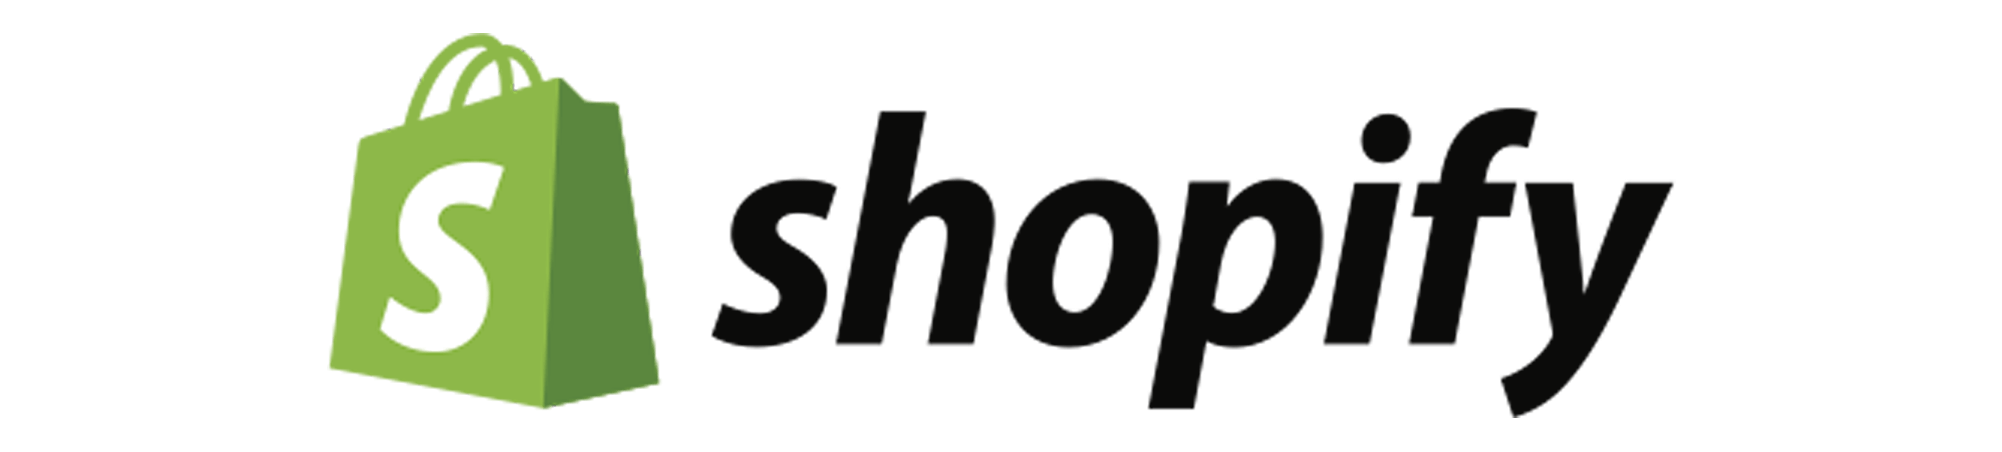 Shopify logo1